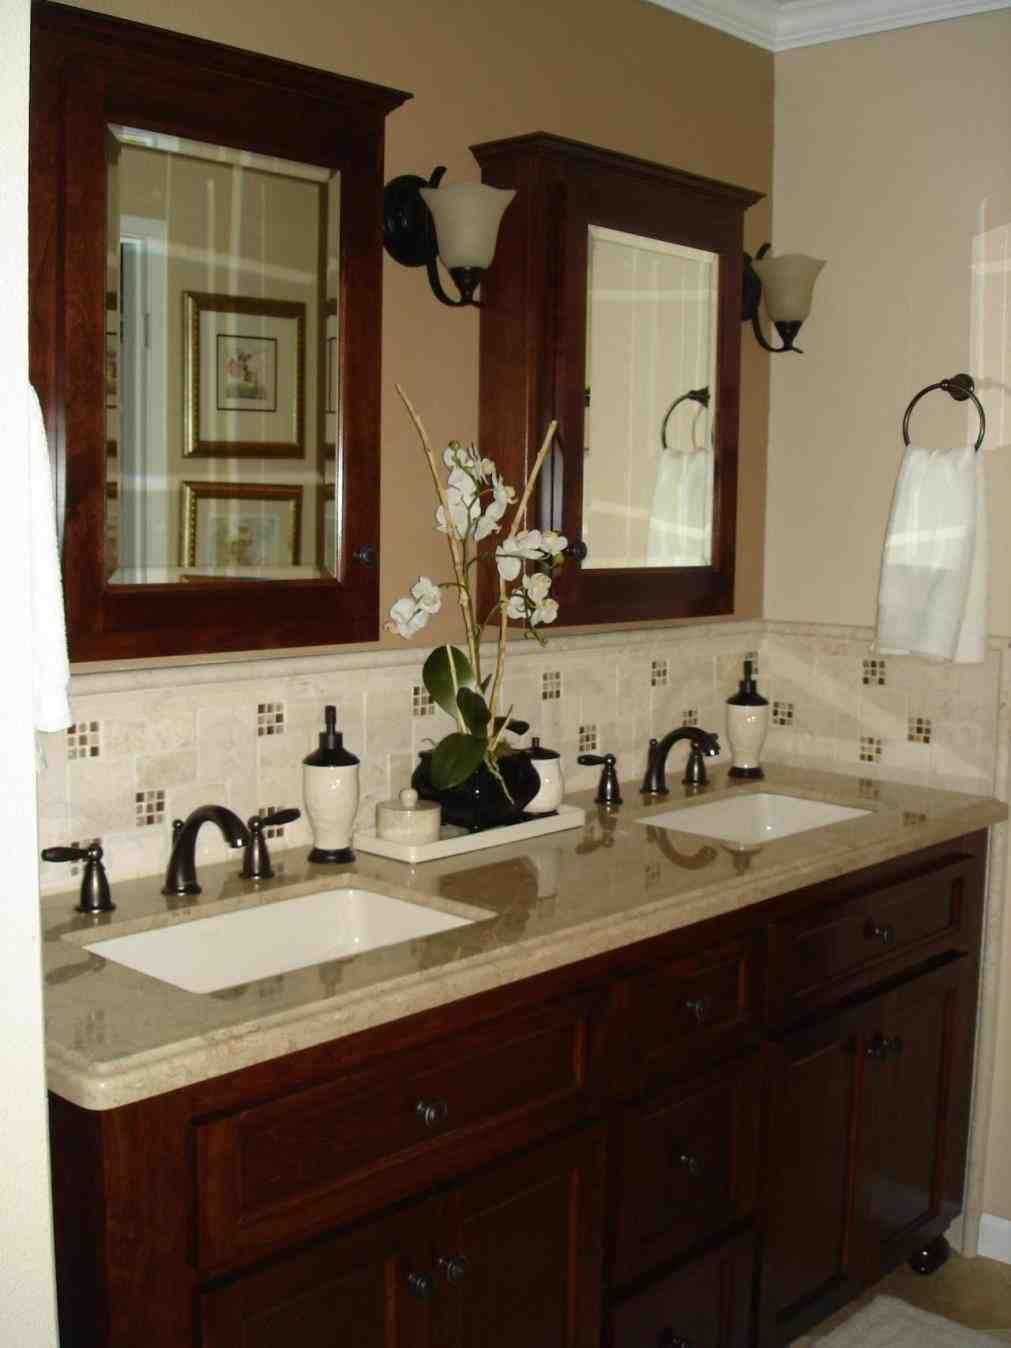 This bathroom backsplash ideas granite countertops kitchen backsplash ideas with light granite full size